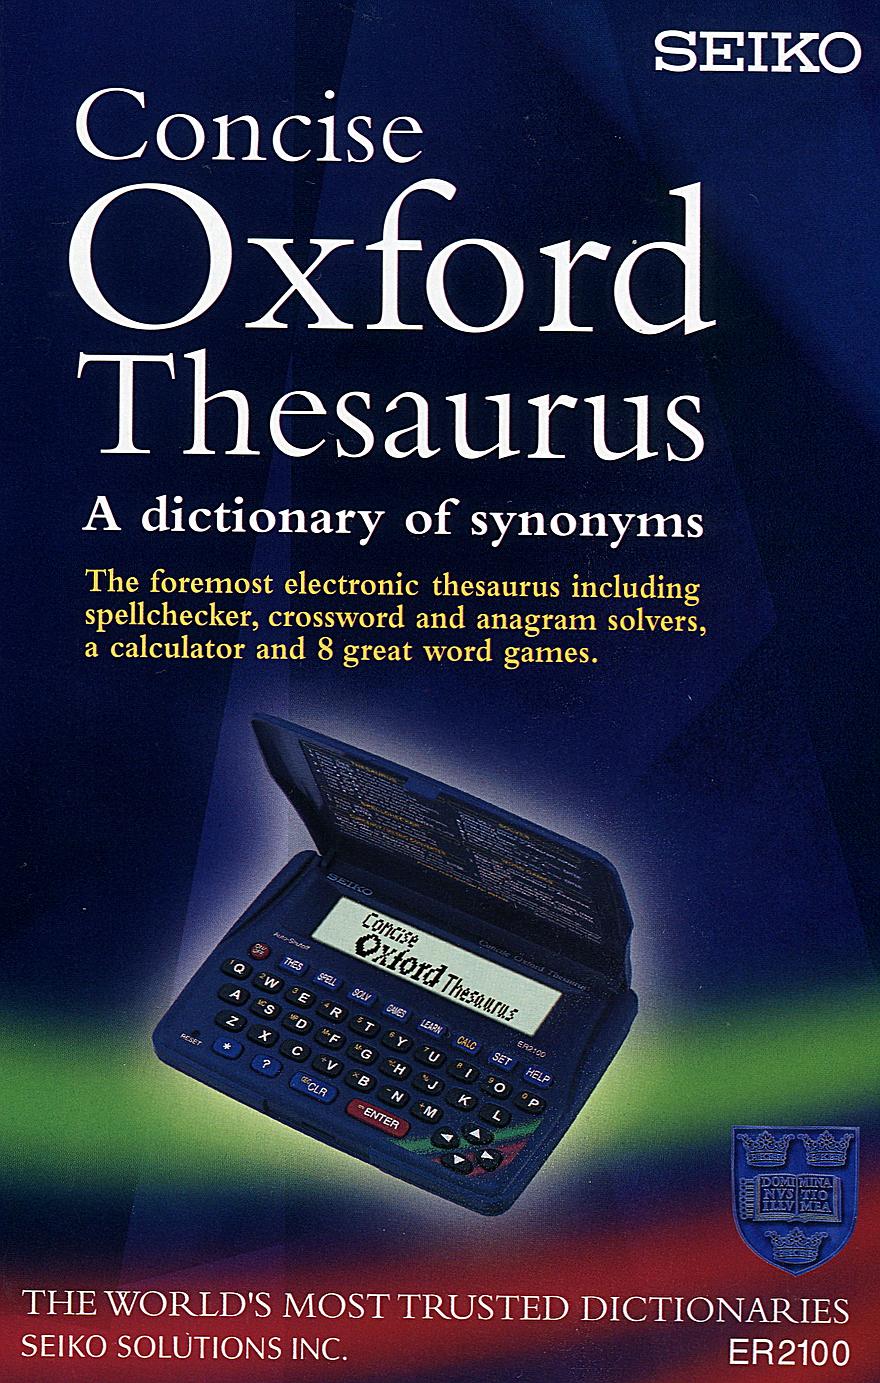 Seiko ER-2100 Concise Oxford Thesaurus and Spellchecker.